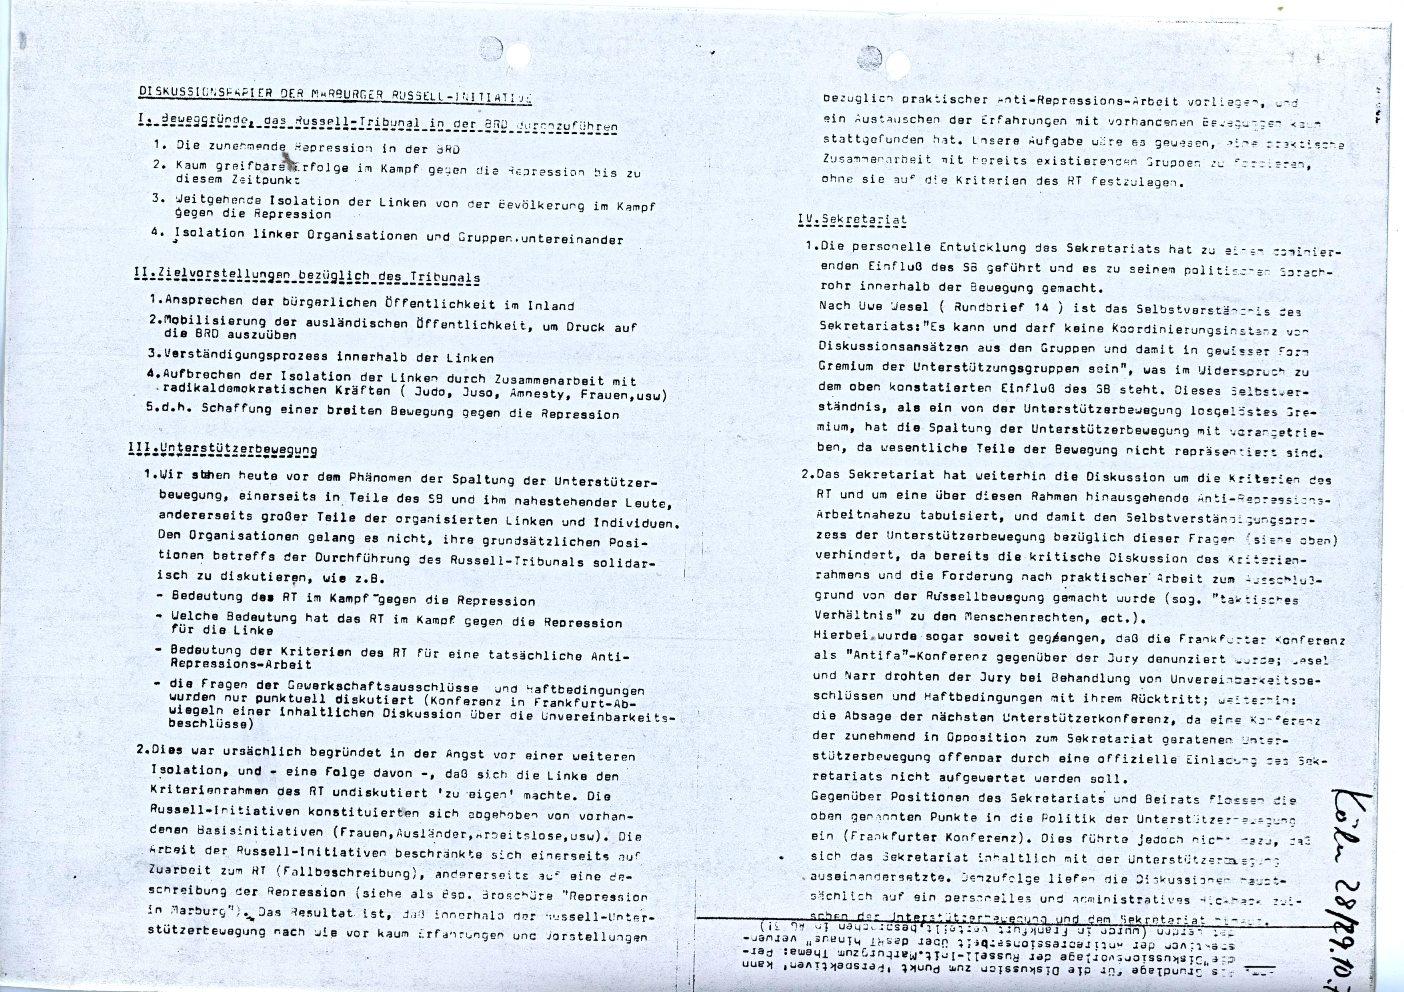 Marburg_Russell_Ini_1978_Diskussionspapier_01